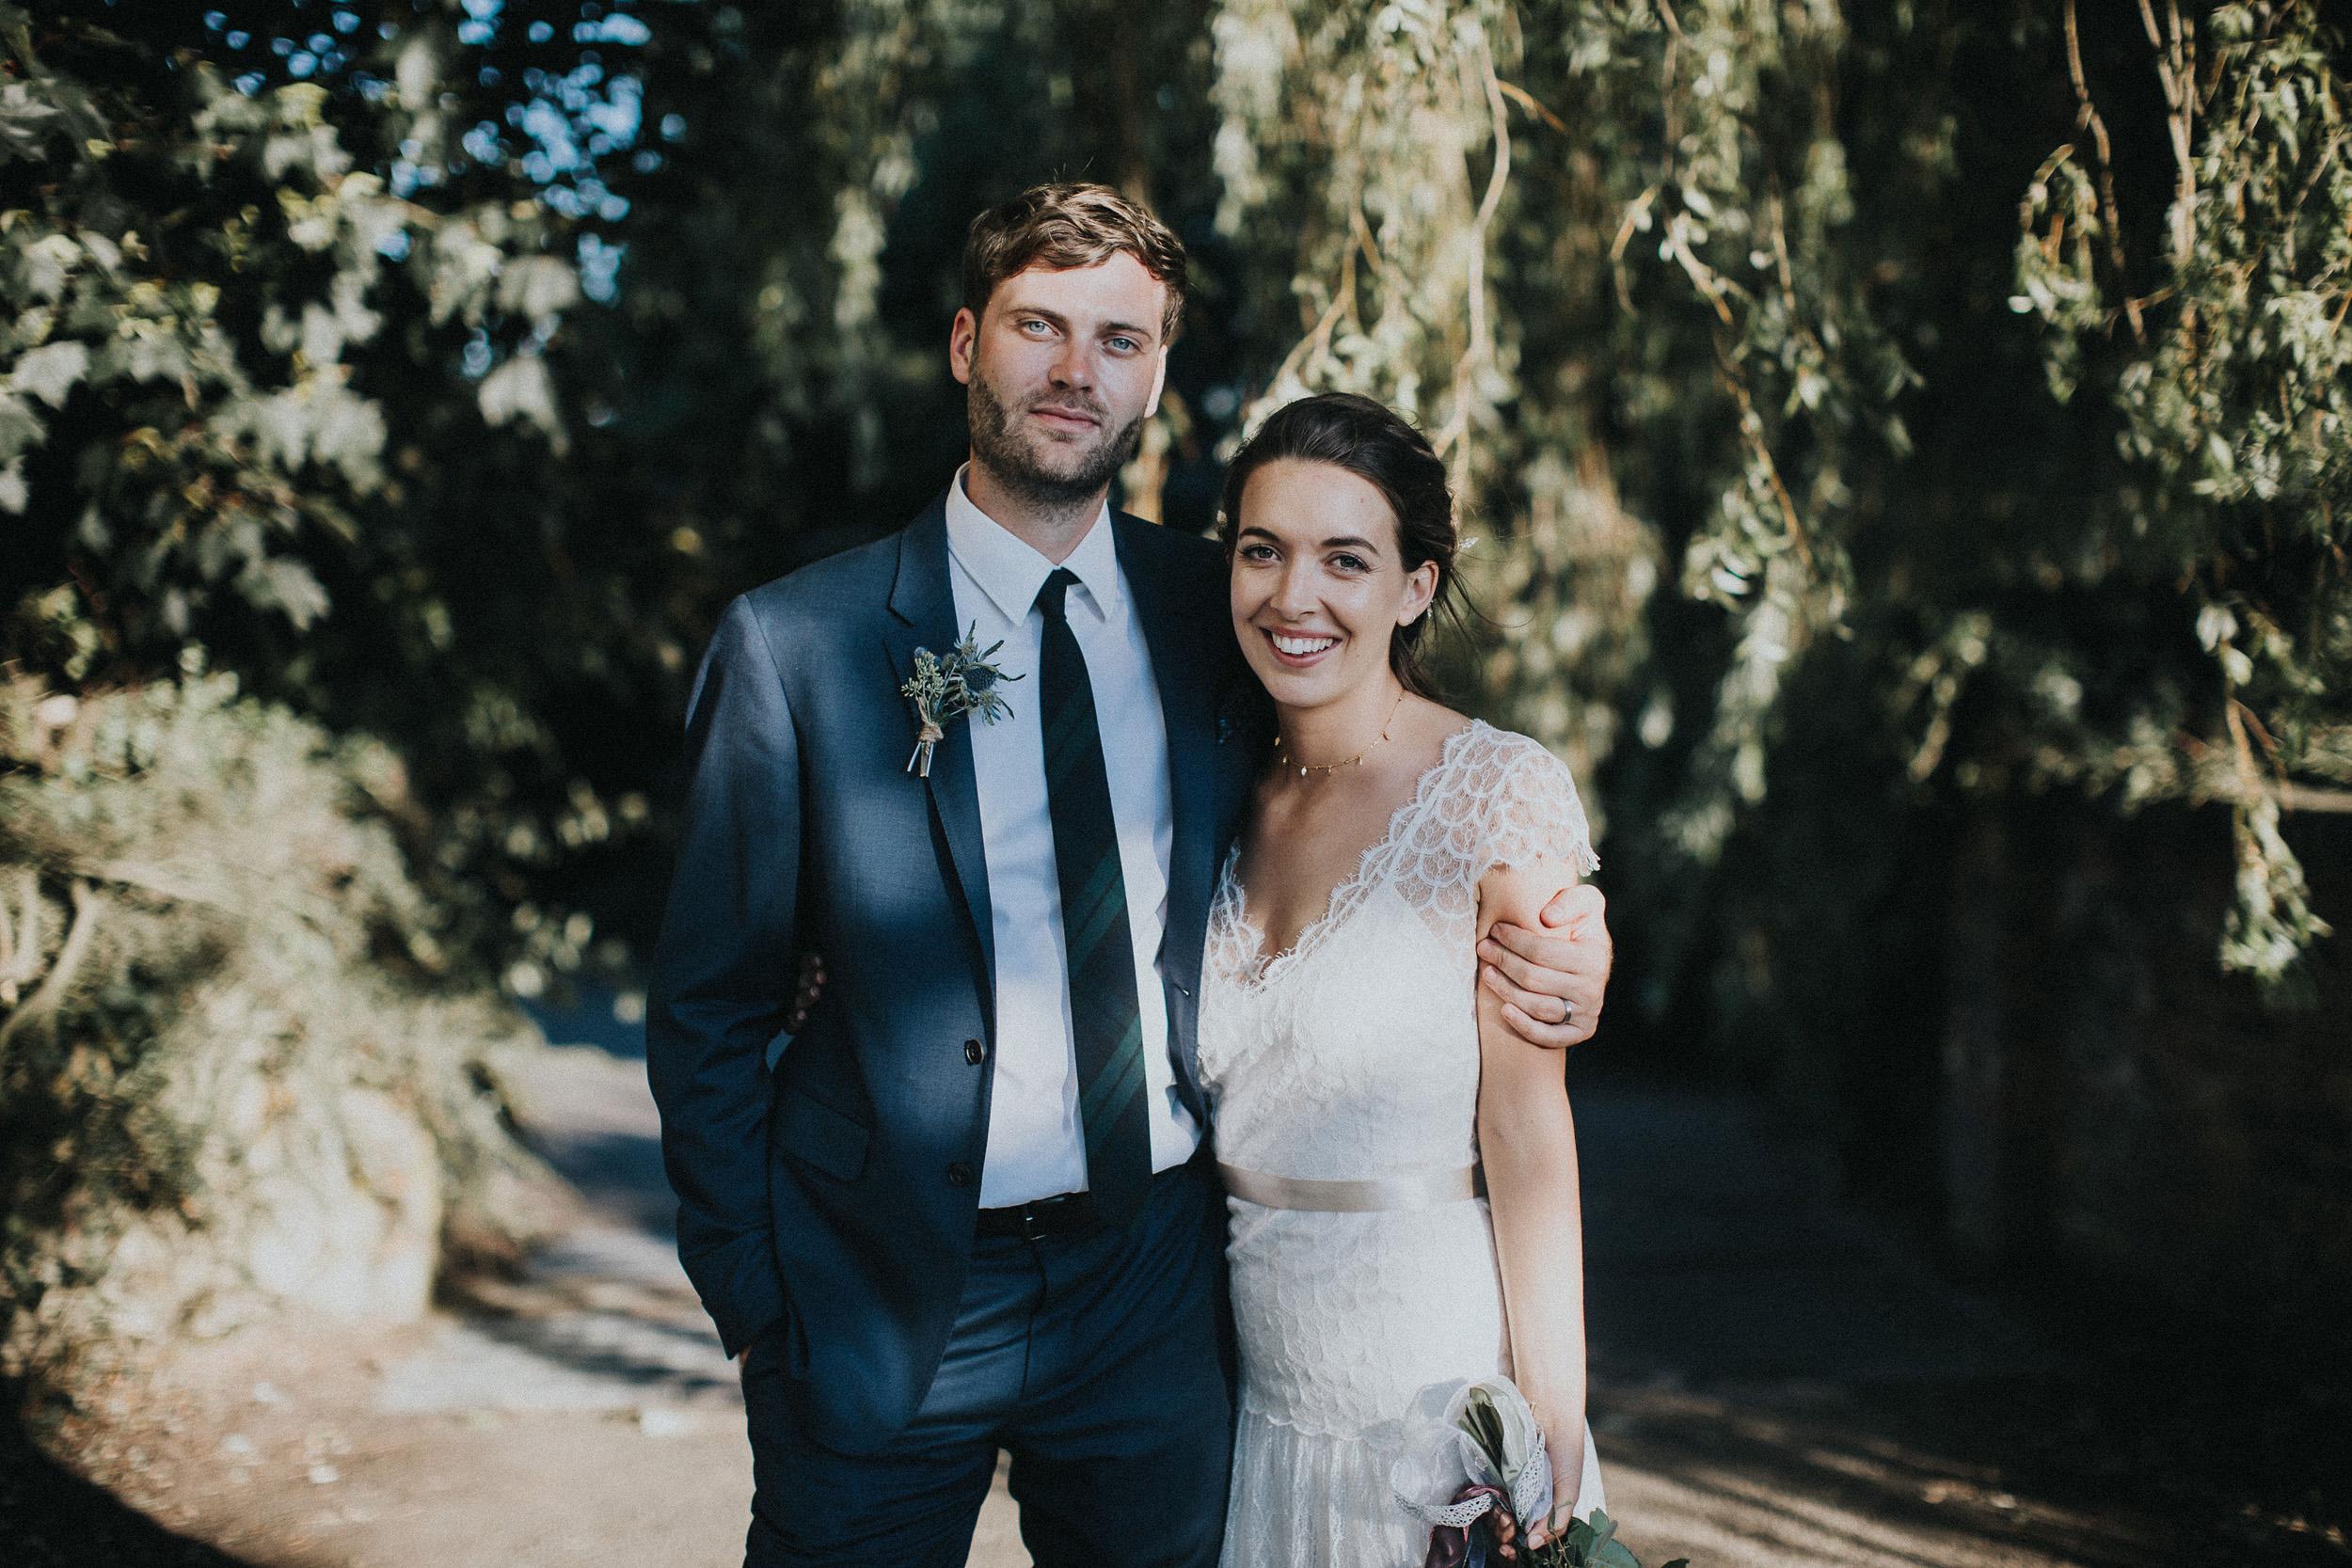 Martha-Laid-Back-Garden-Wedding-Lace-Wedding-Dress-Bohemian-Kate-Beaumont-46.jpg